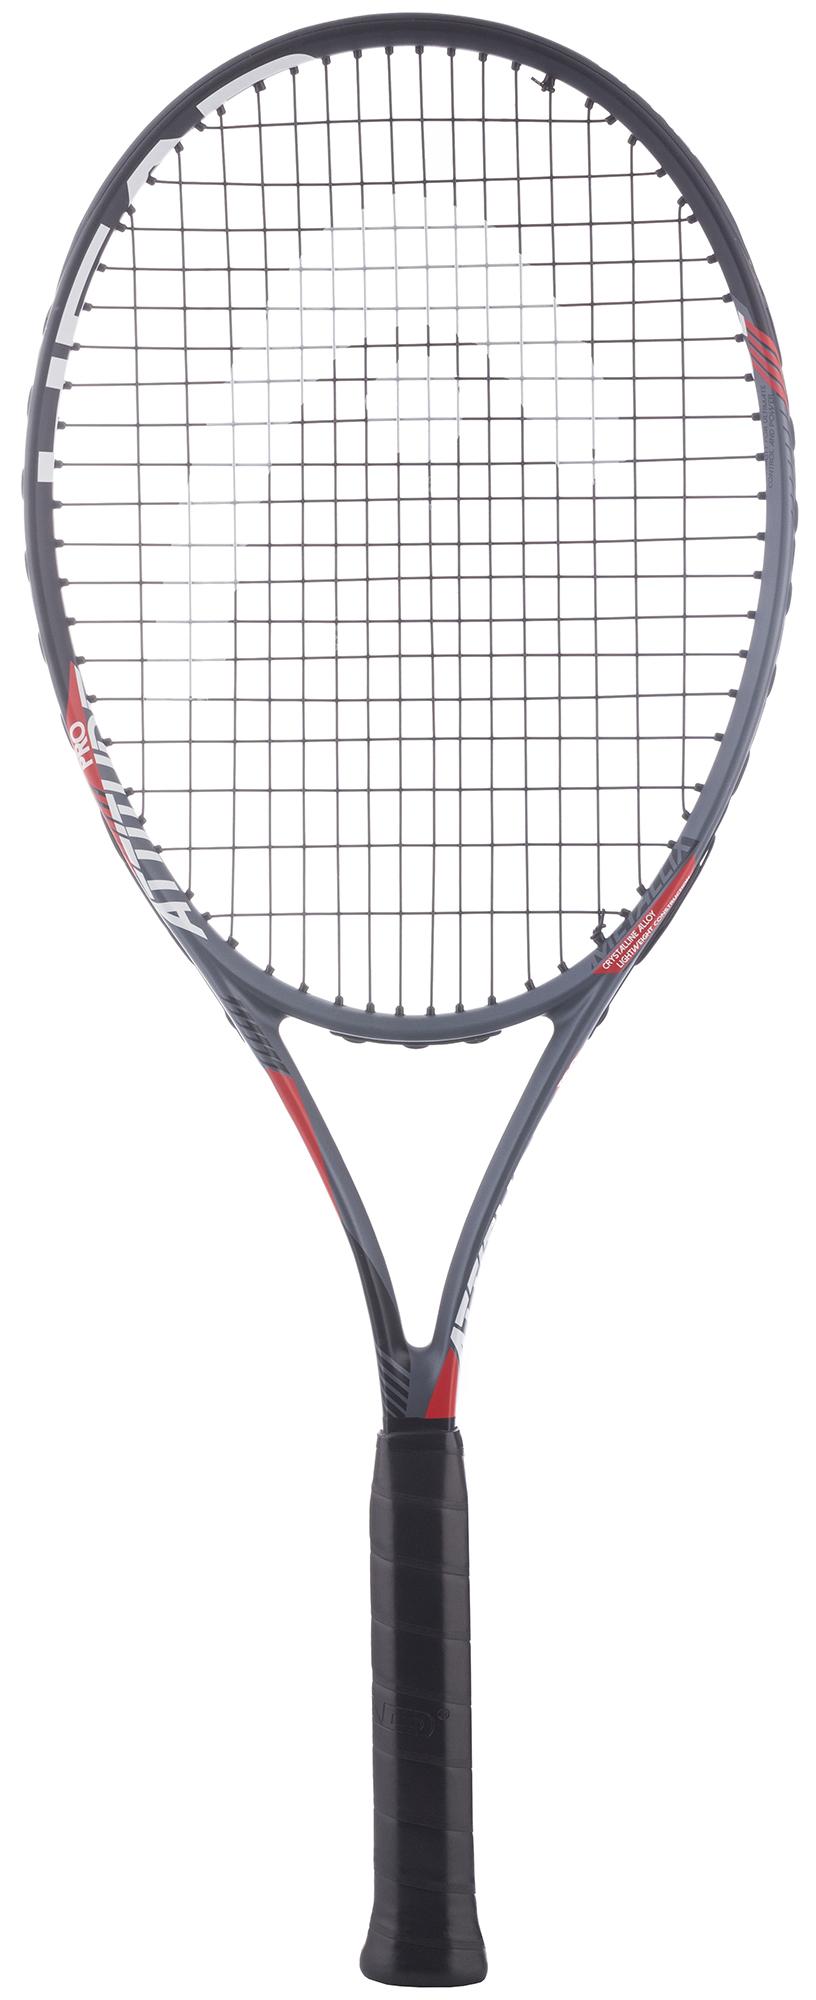 Head Ракетка для большого тенниса Head MX Attitude Pro, размер 3 head ракетка для большого тенниса детская head novak 21 размер без размера